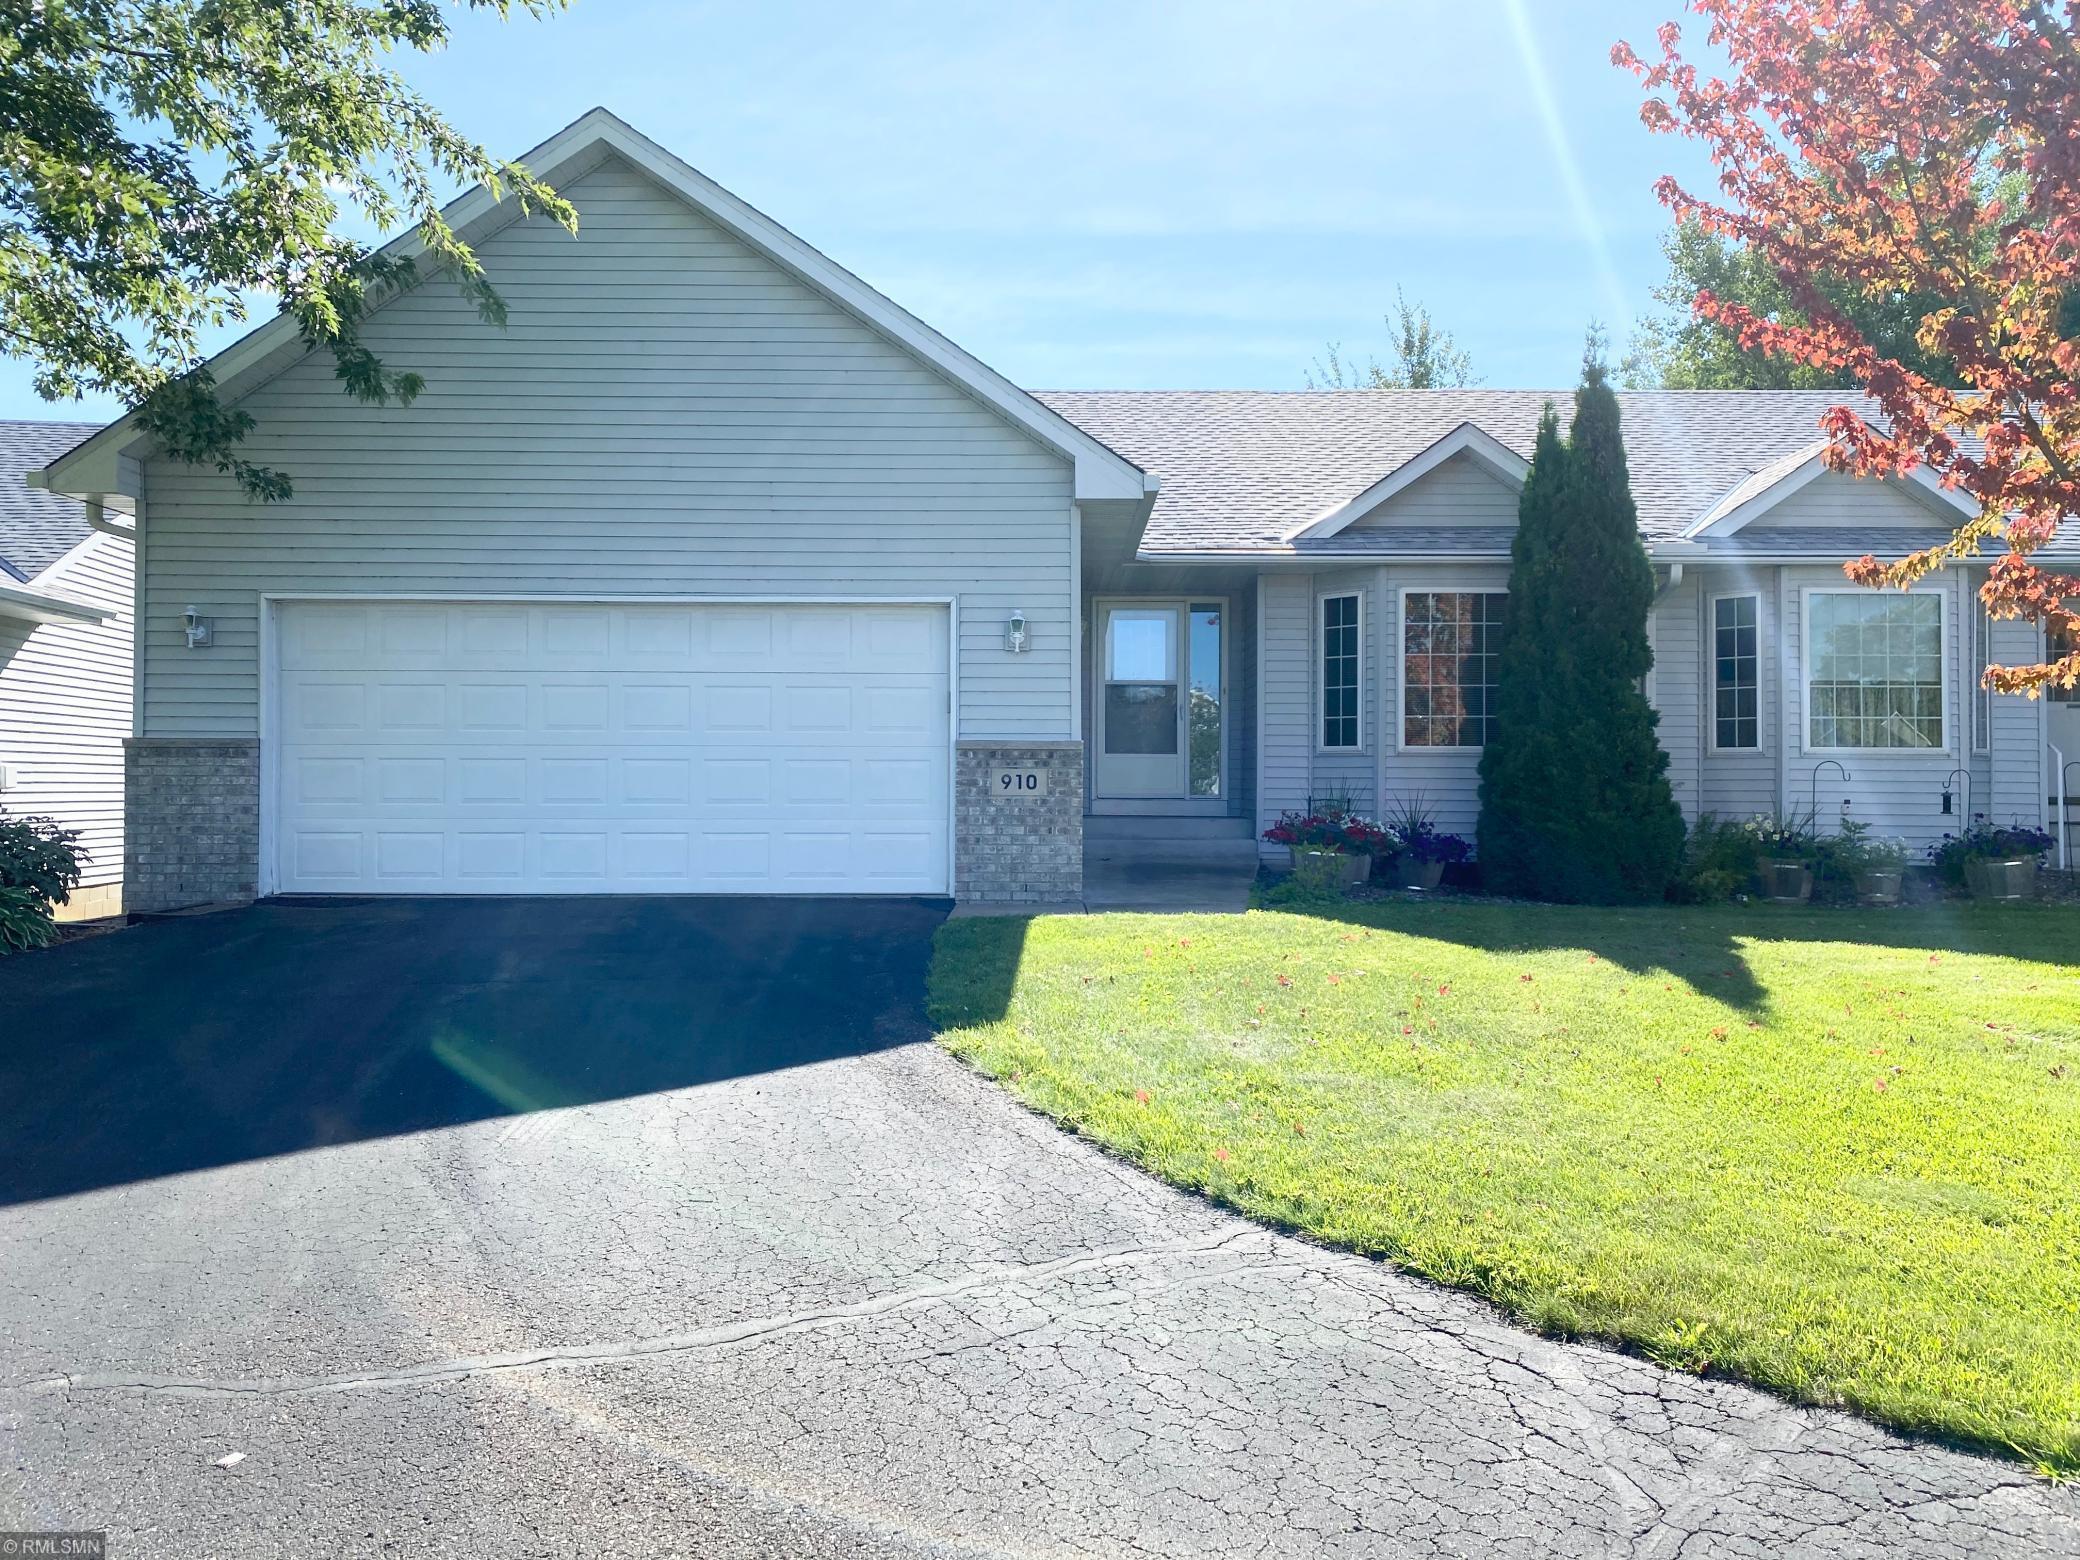 910 Shady Ridge Lane Property Photo - Braham, MN real estate listing